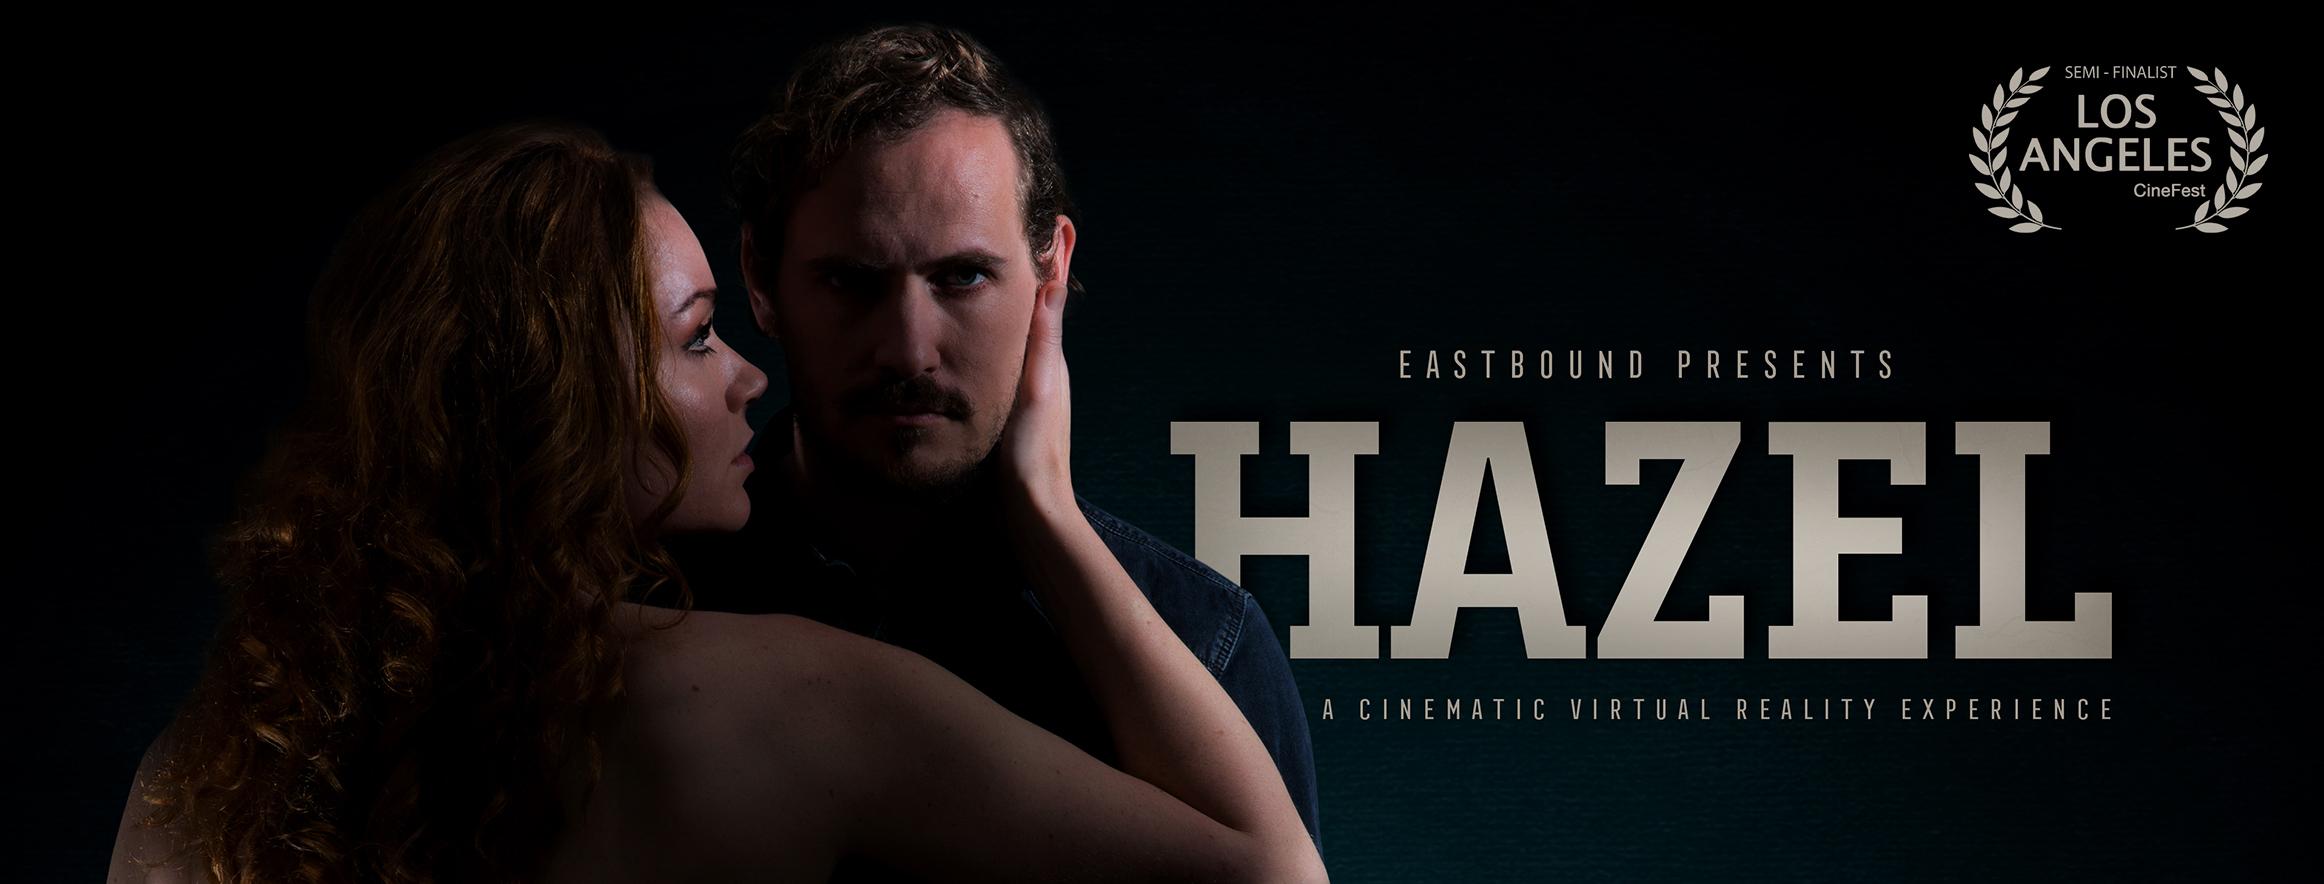 CINEMATIC VR EXPERIENCE 'HAZEL'